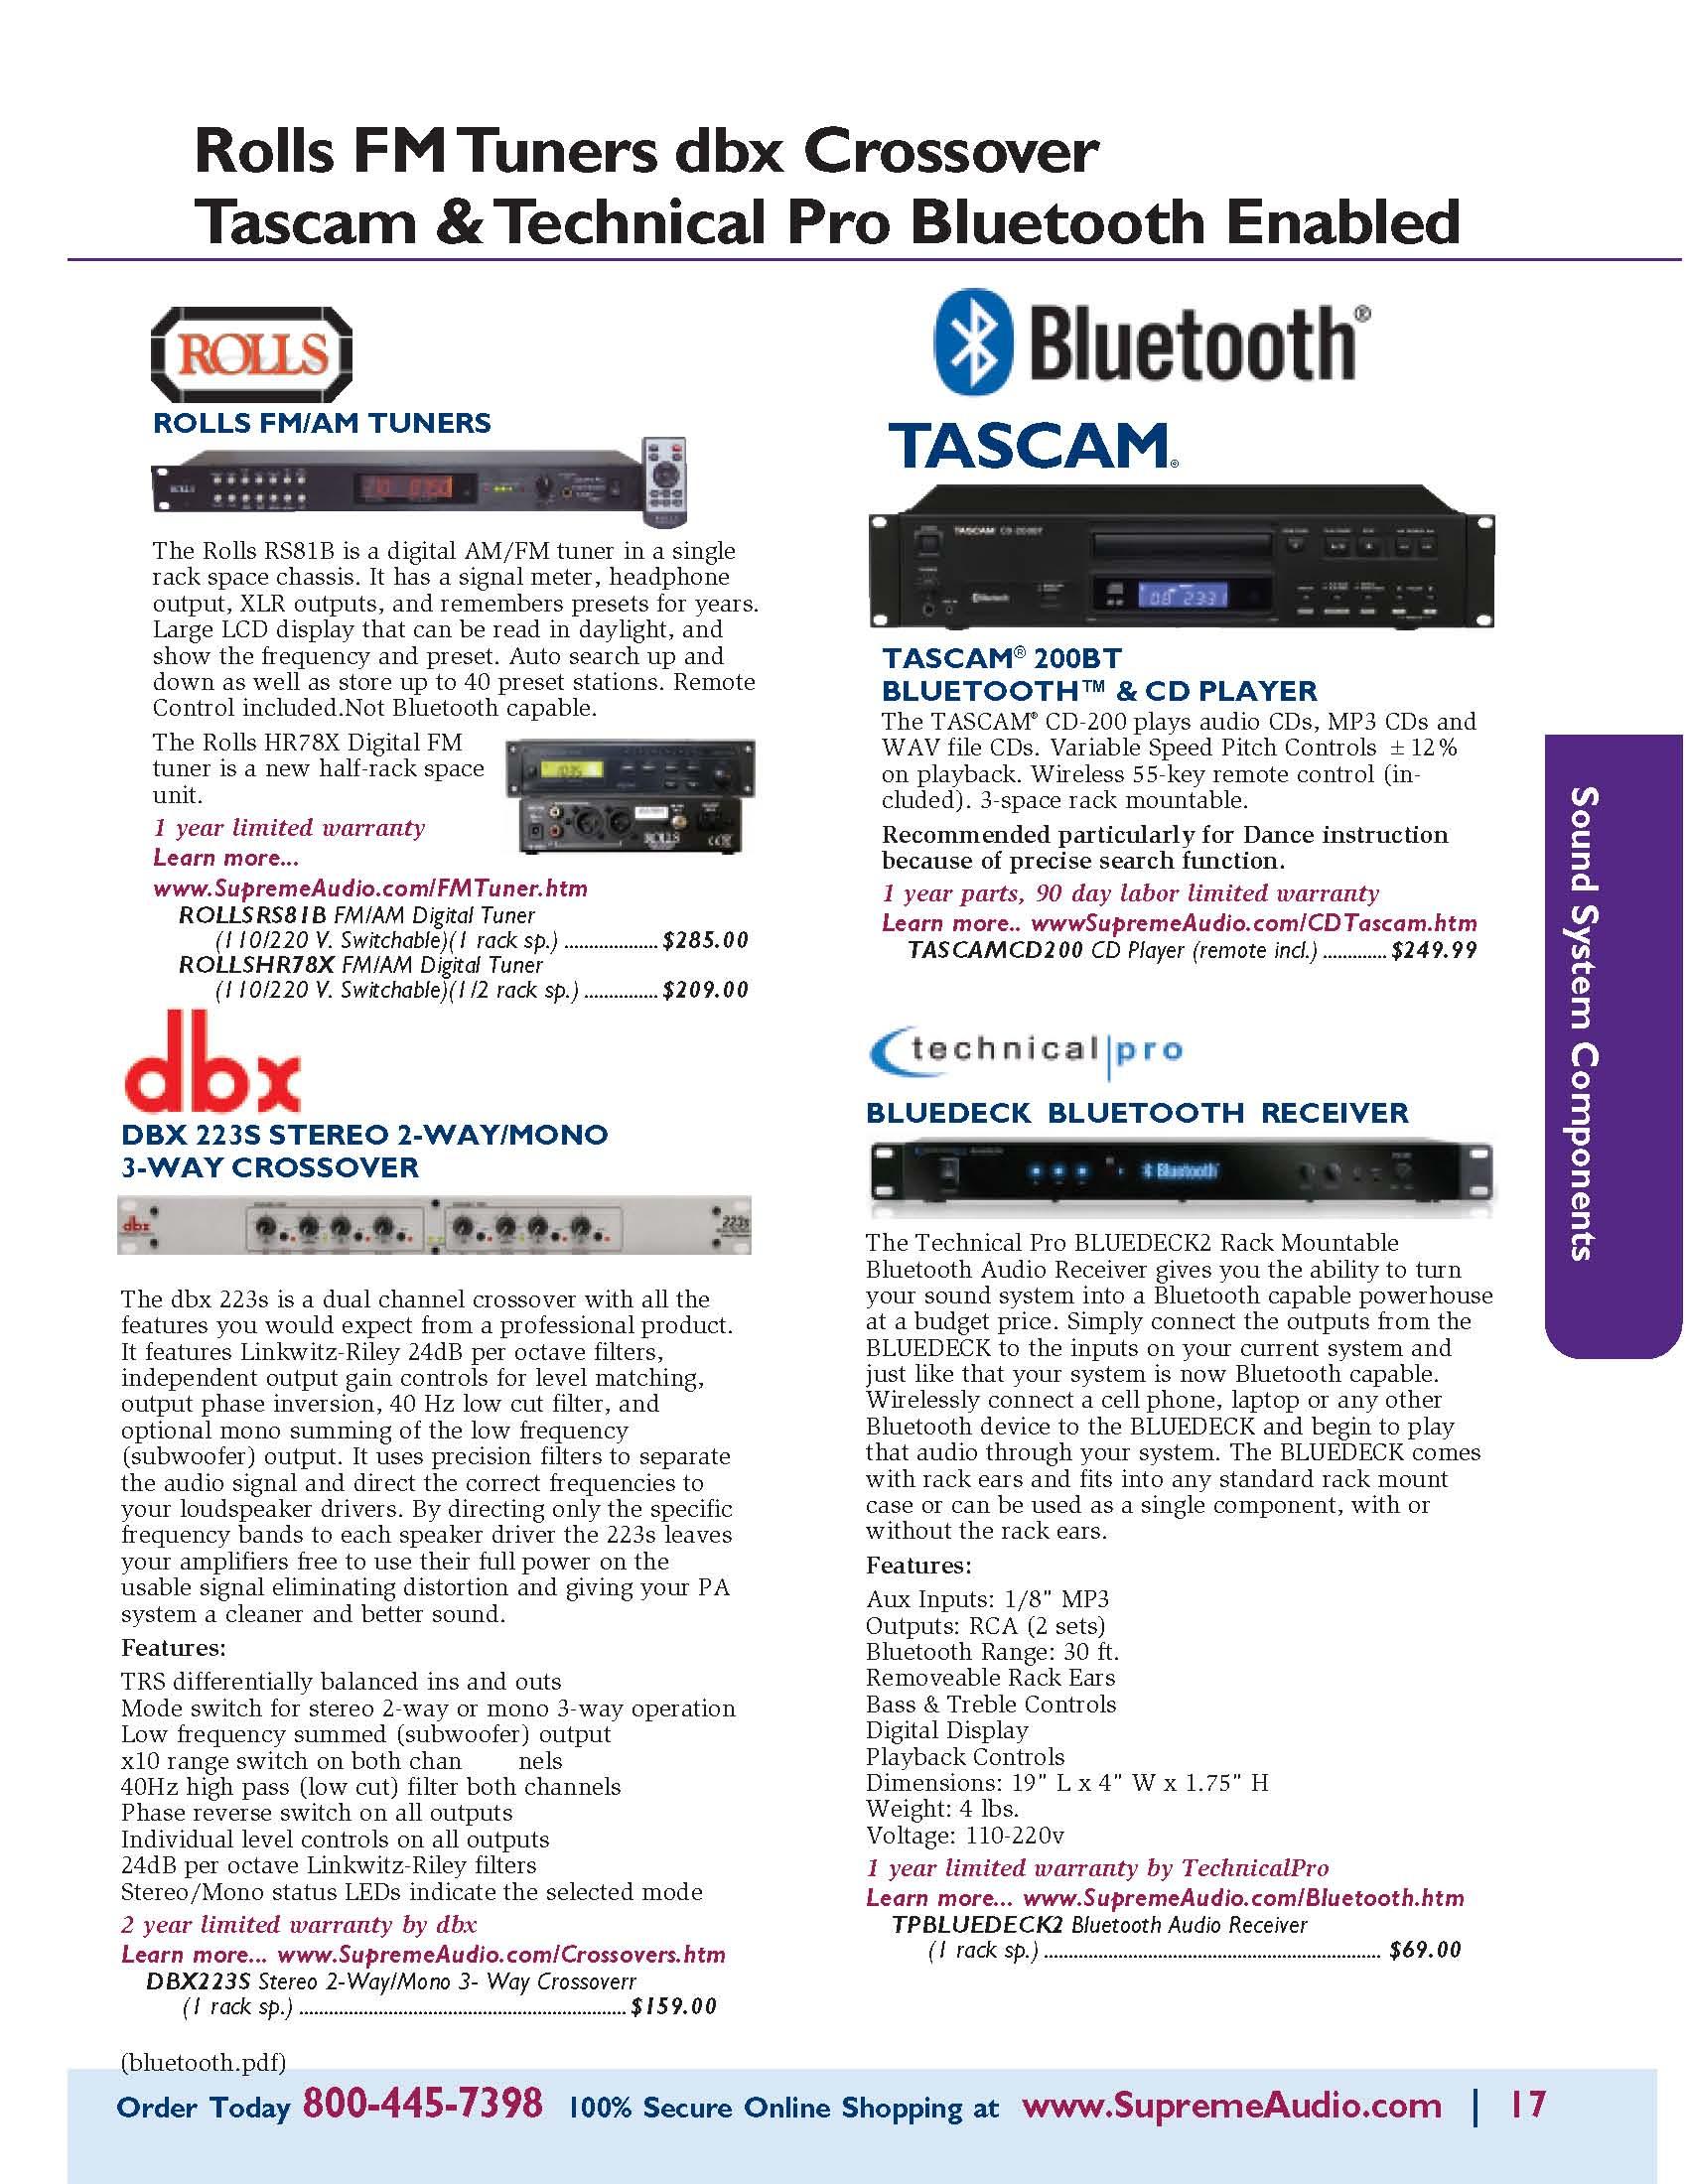 Rolls FM Tuner, dbx Crossover Tascam CD/Bluetooth Receiver Bluedeck Bluetooth Receiver